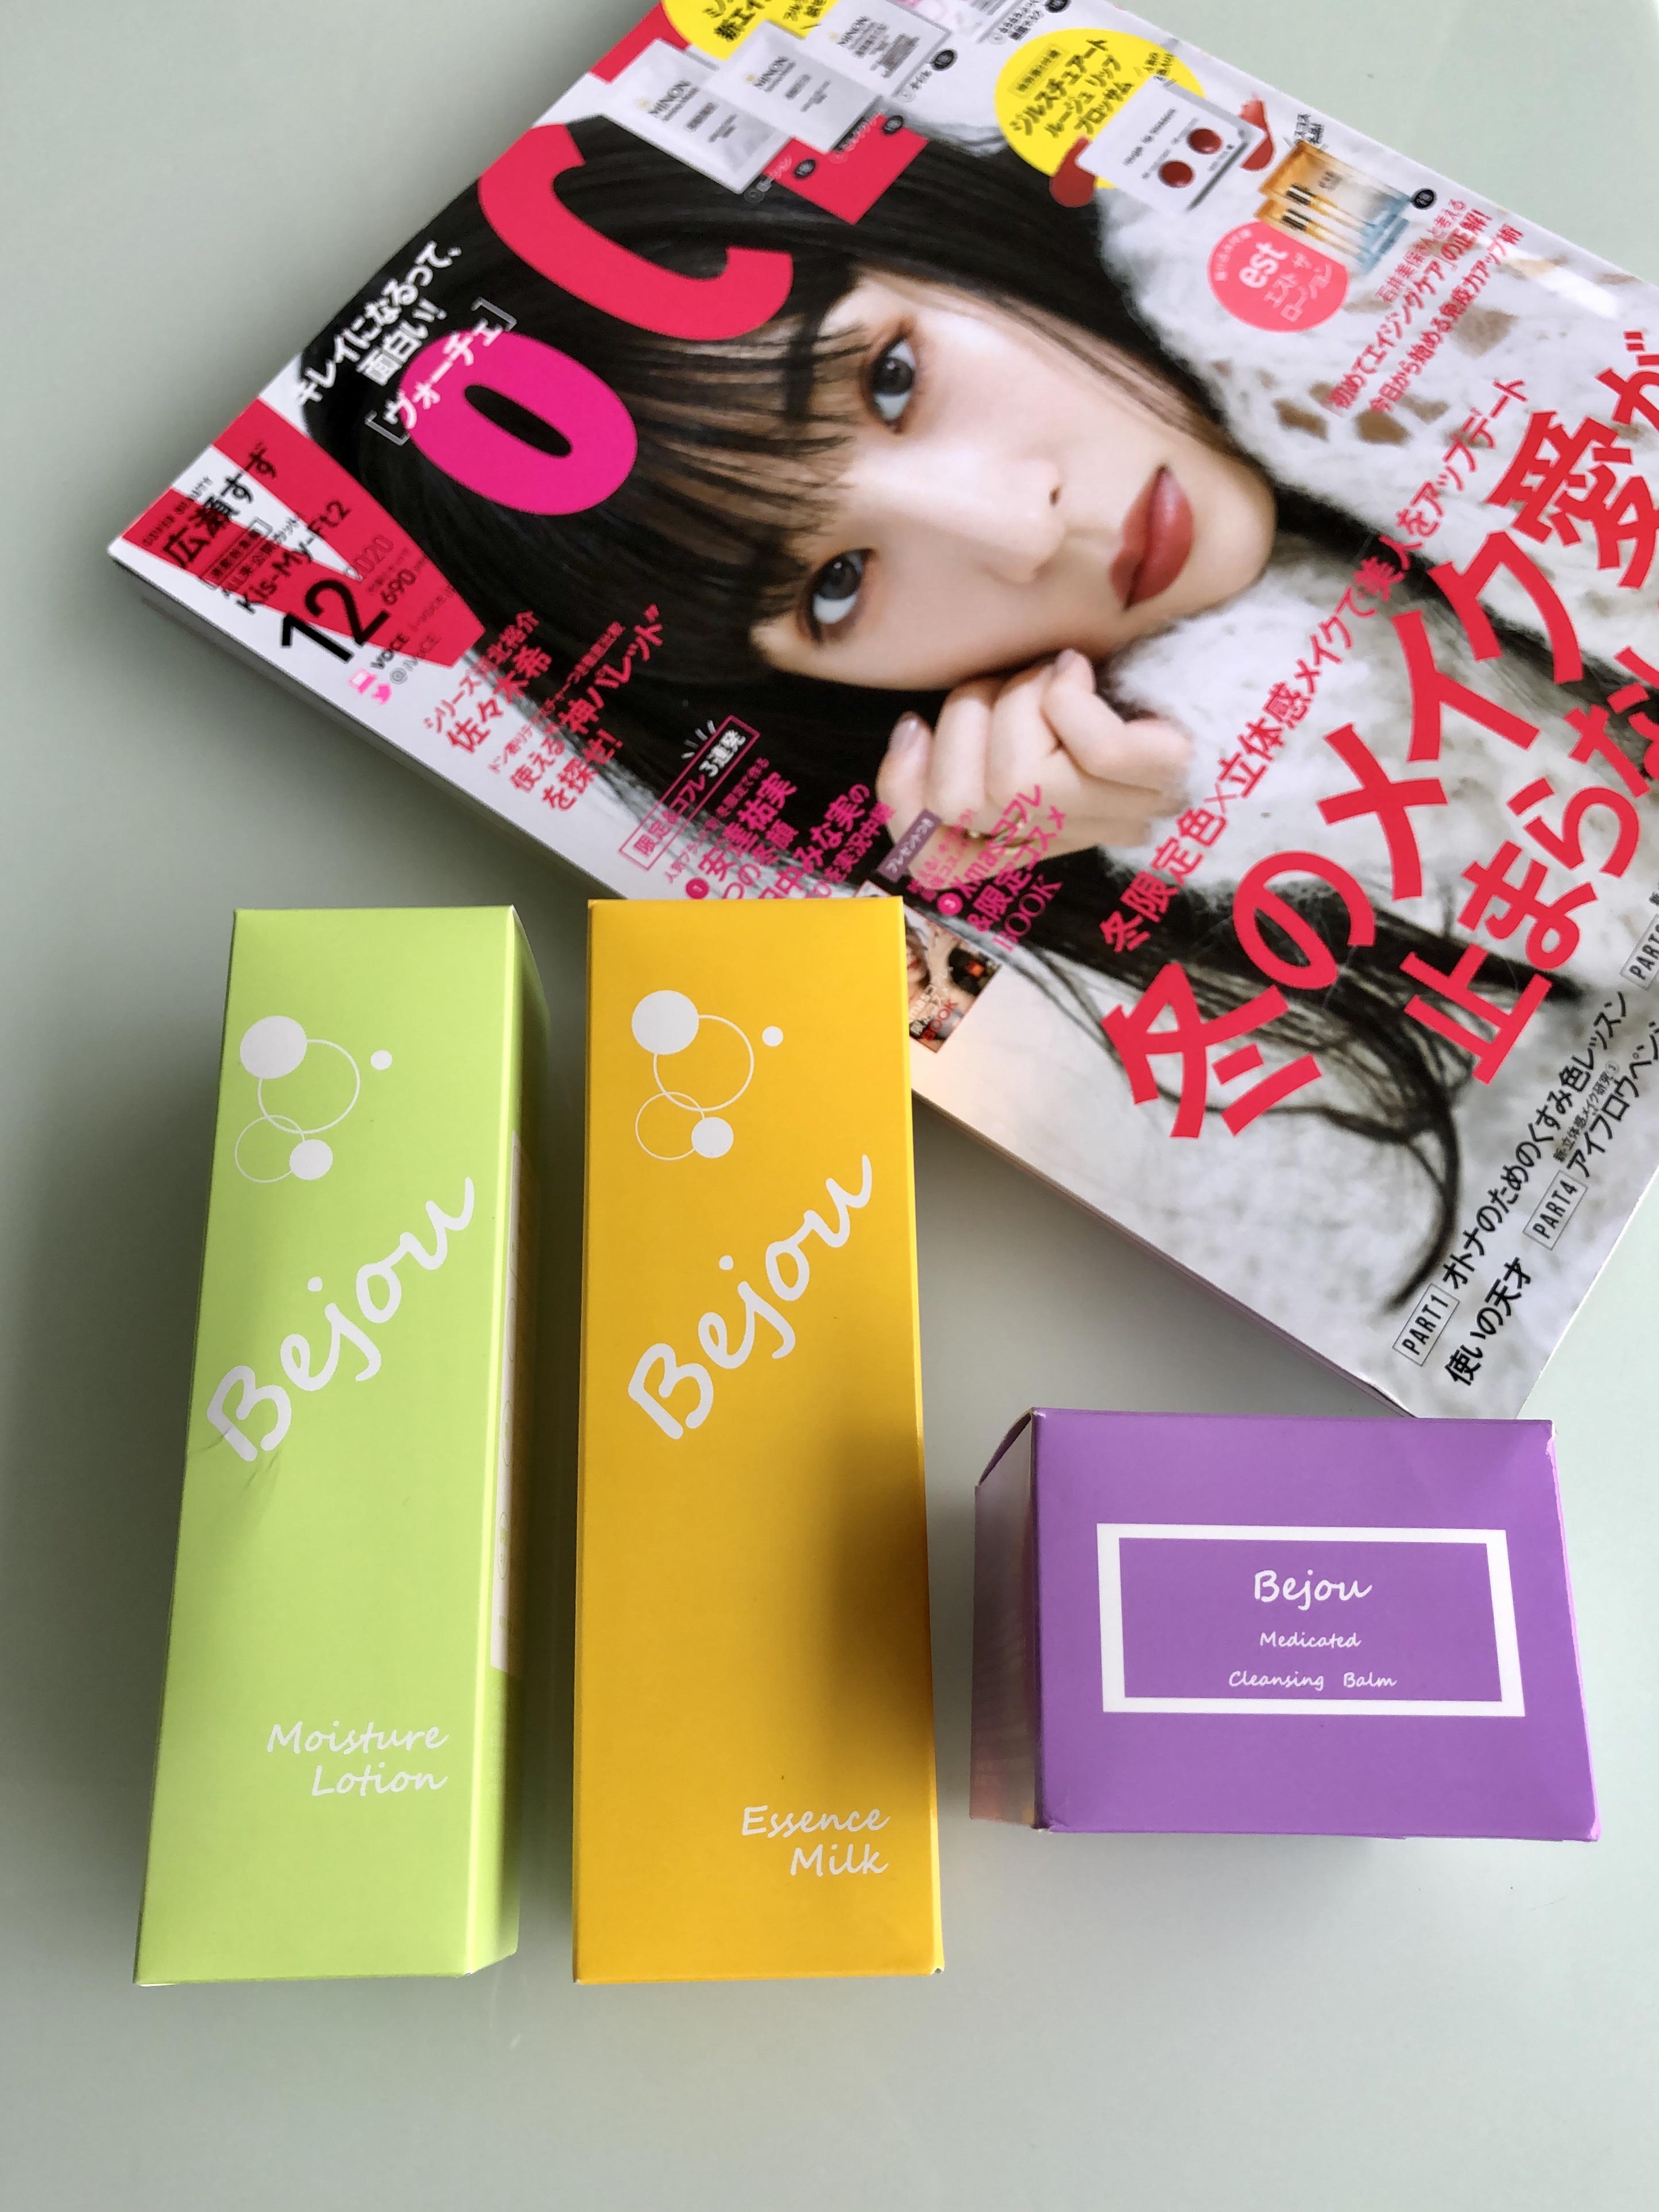 『VOCE ヴォーチェ 12月号』に掲載☆彡注目の美容雑誌掲載コスメ